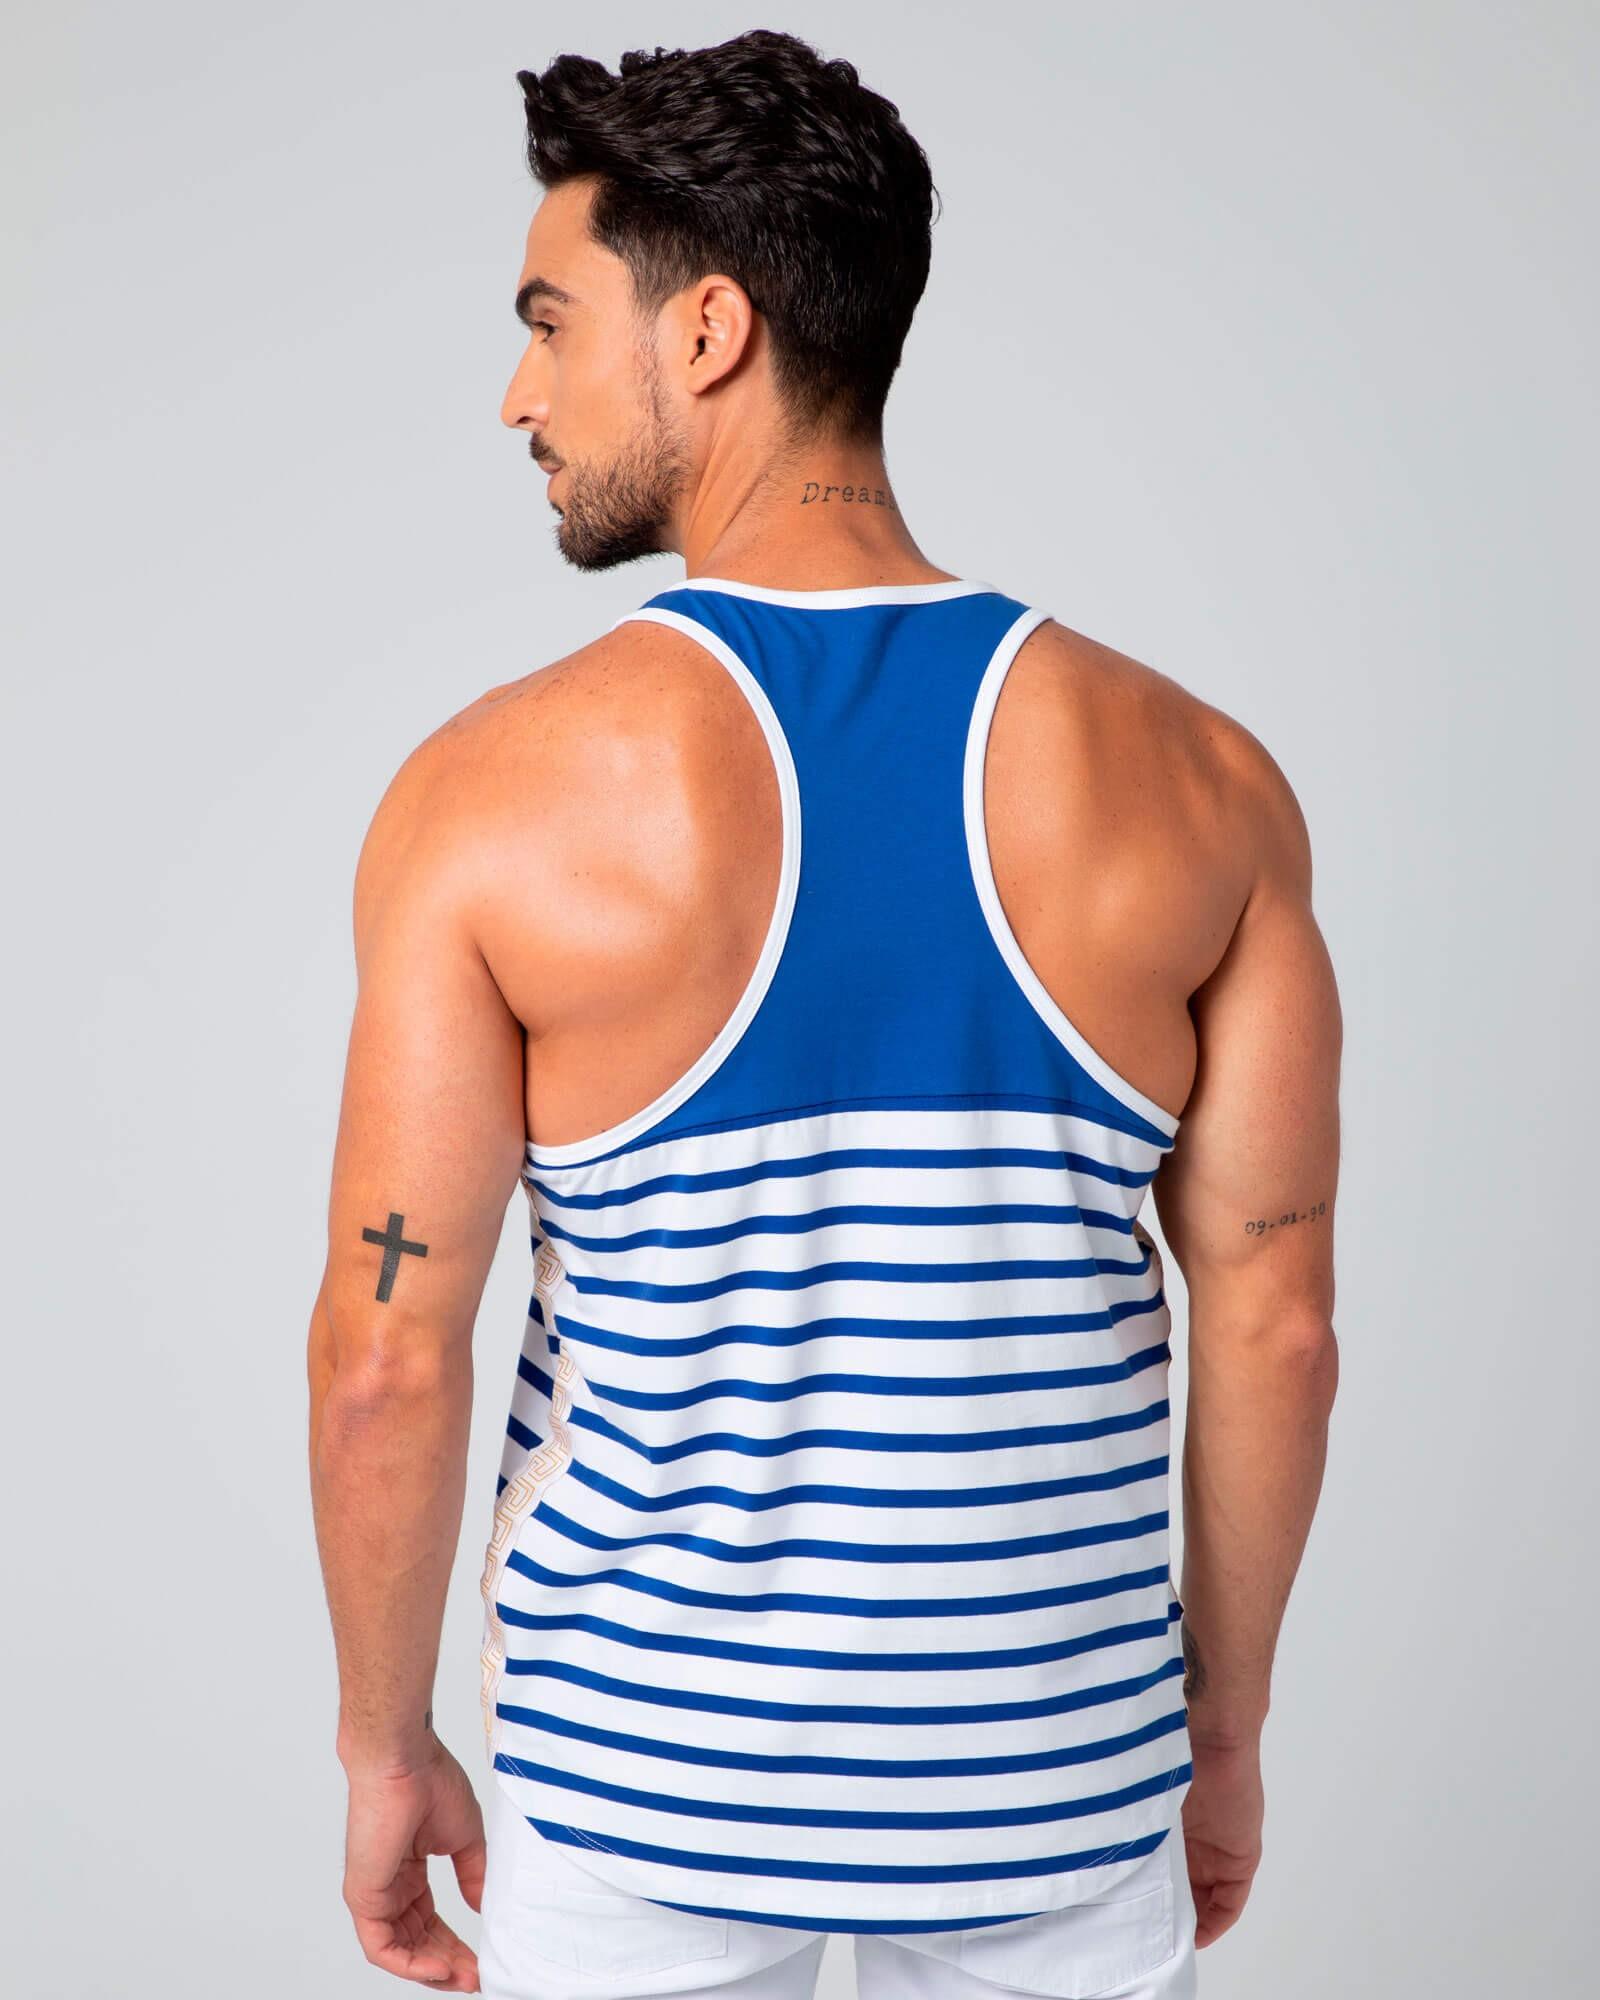 Camiseta sin mangas Greek. Estilo urbano ELIU streetwear.